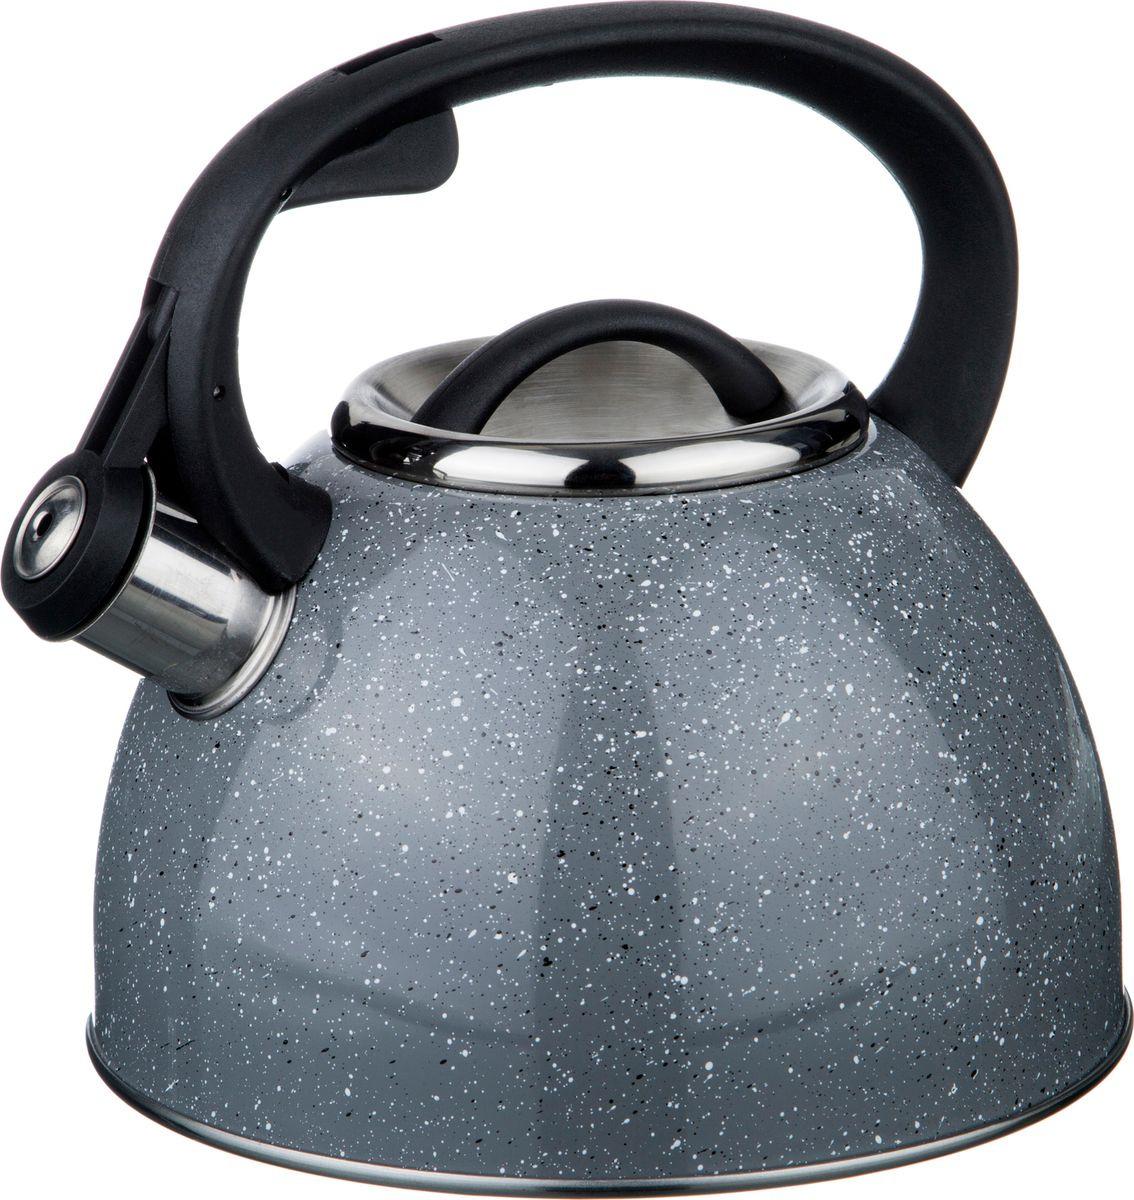 цена на Чайник Agness Монблан, со свистком, 907-064, серый, 2,5 л